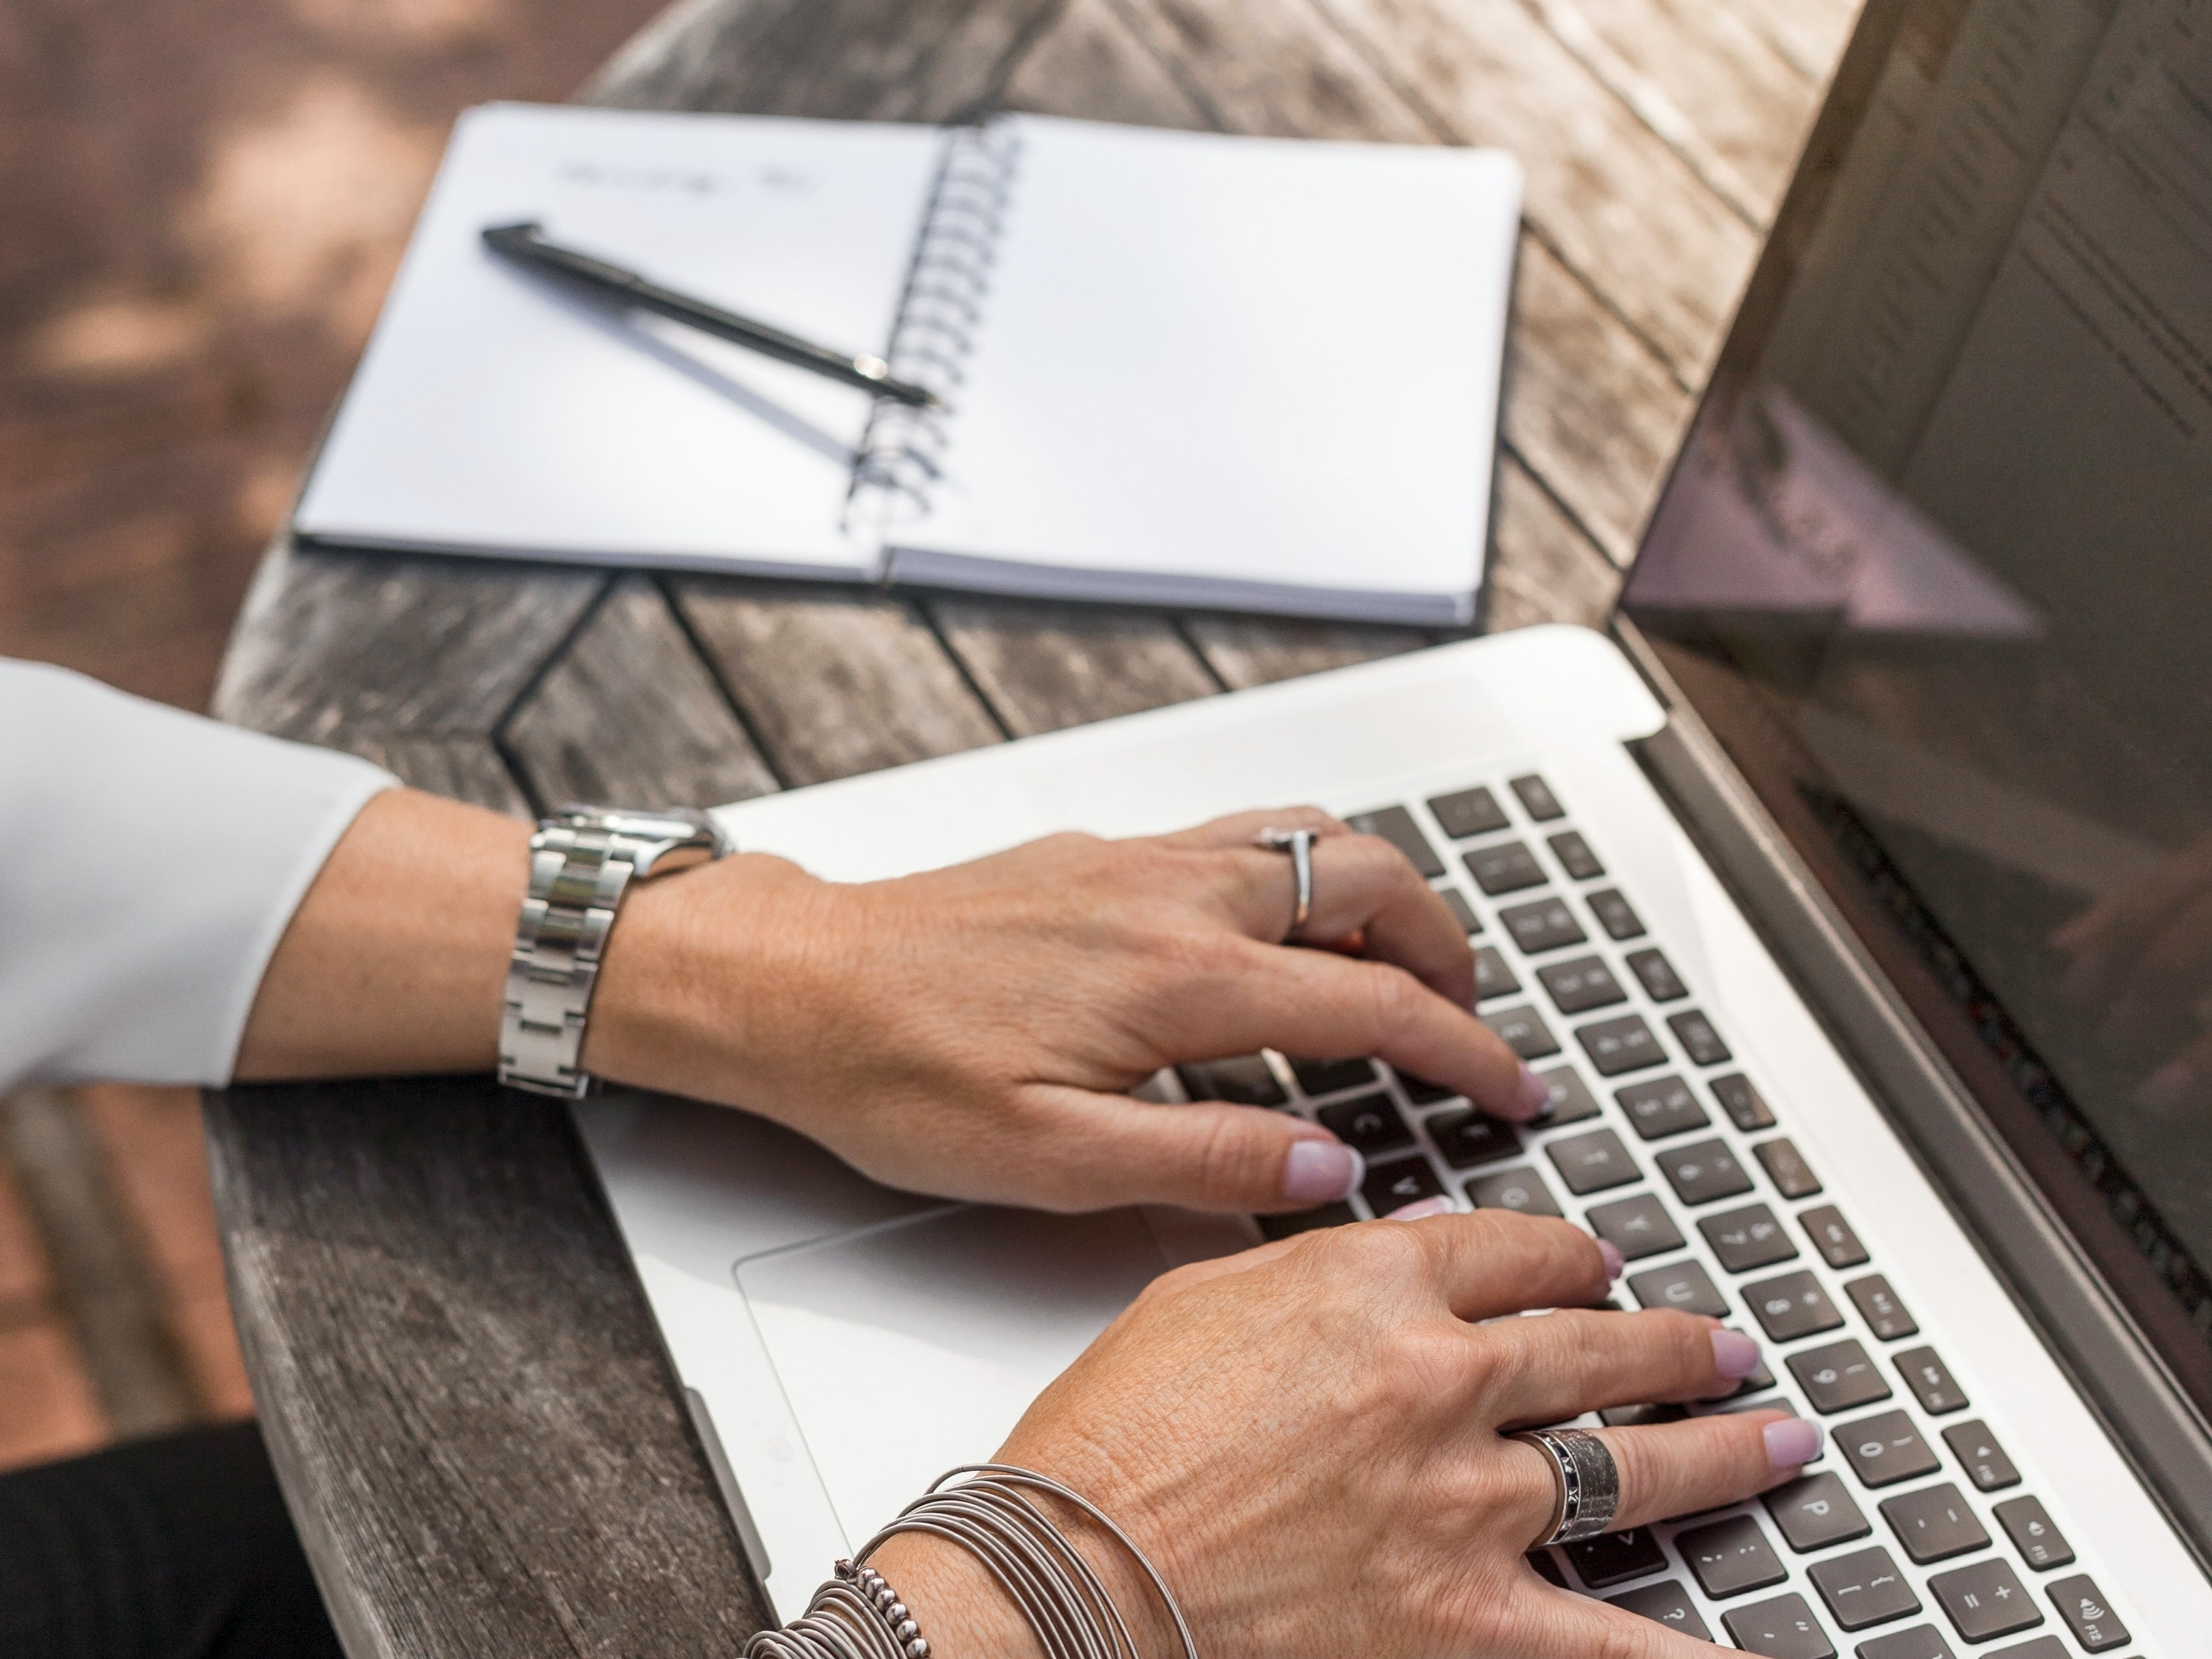 Activity: Write a better professional bio